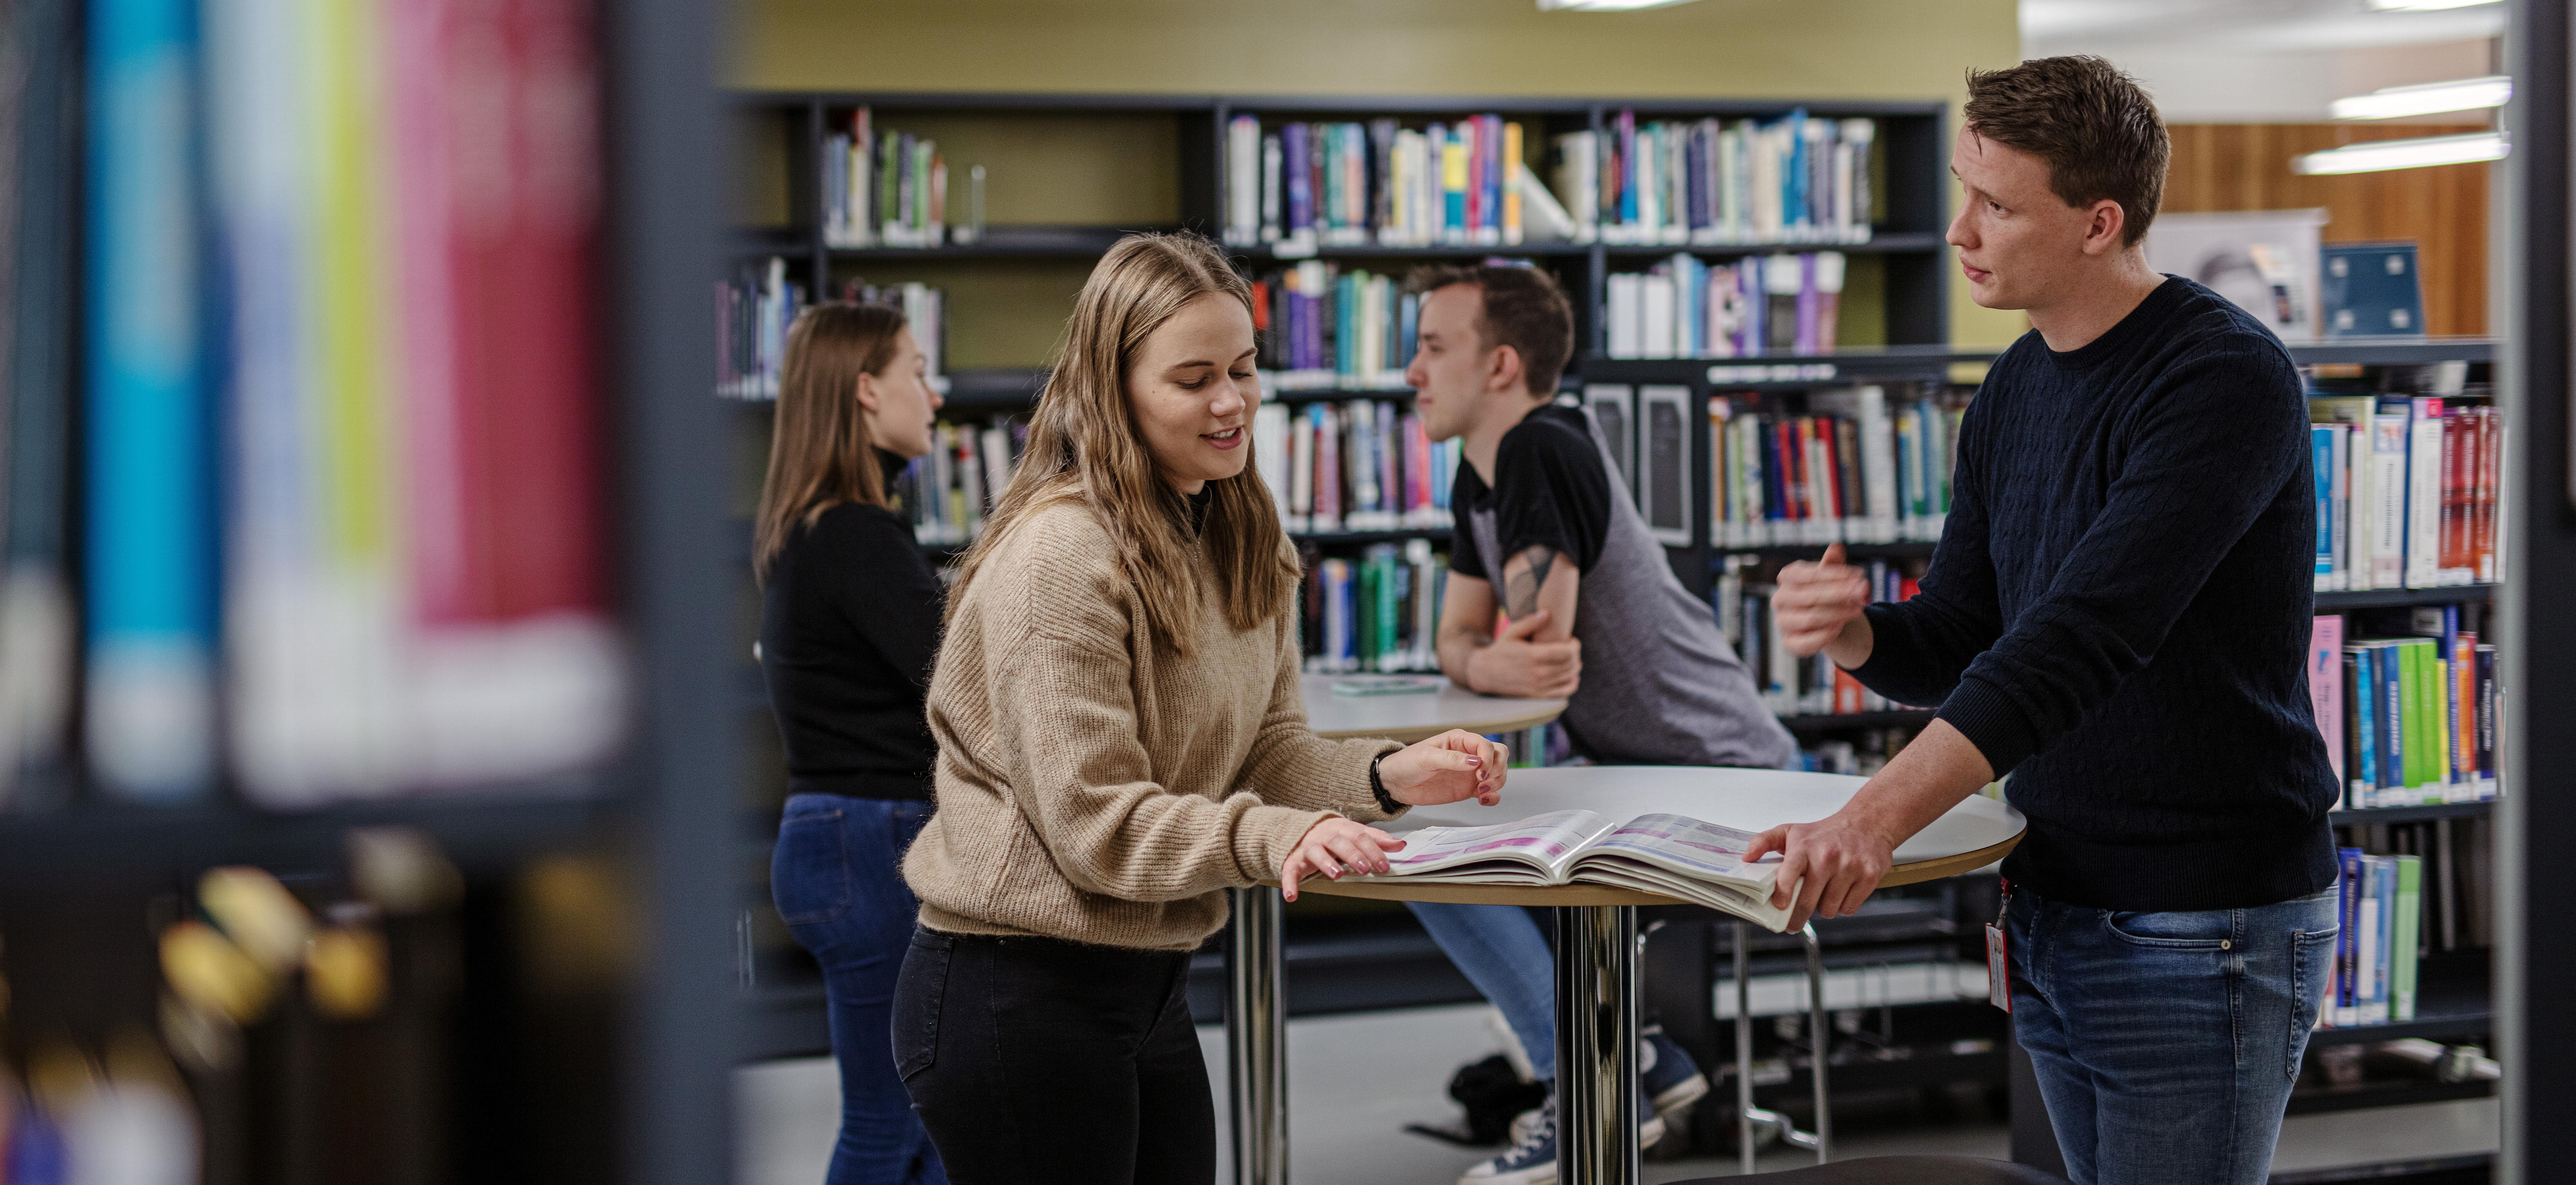 Studenter på Bibliotek for medisin og helsefag ved NTNU. Bilde